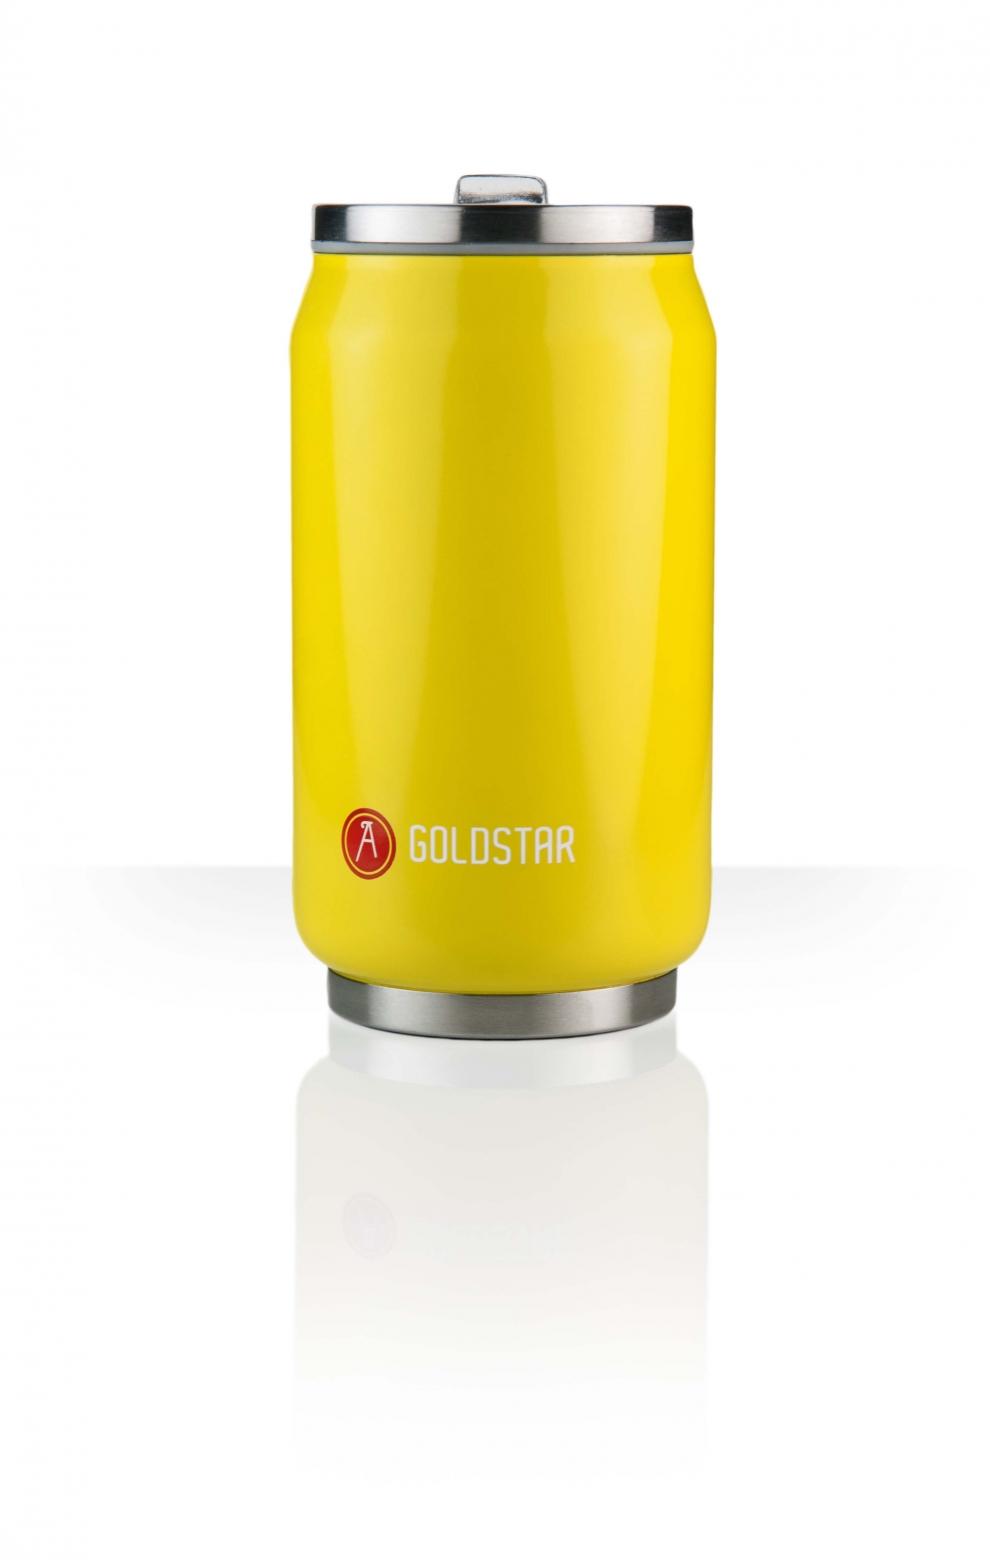 Goldstar Isotherme 116c 33 Cl Pantone Canette Brillant Can'it Jaune bIeEHYWD29